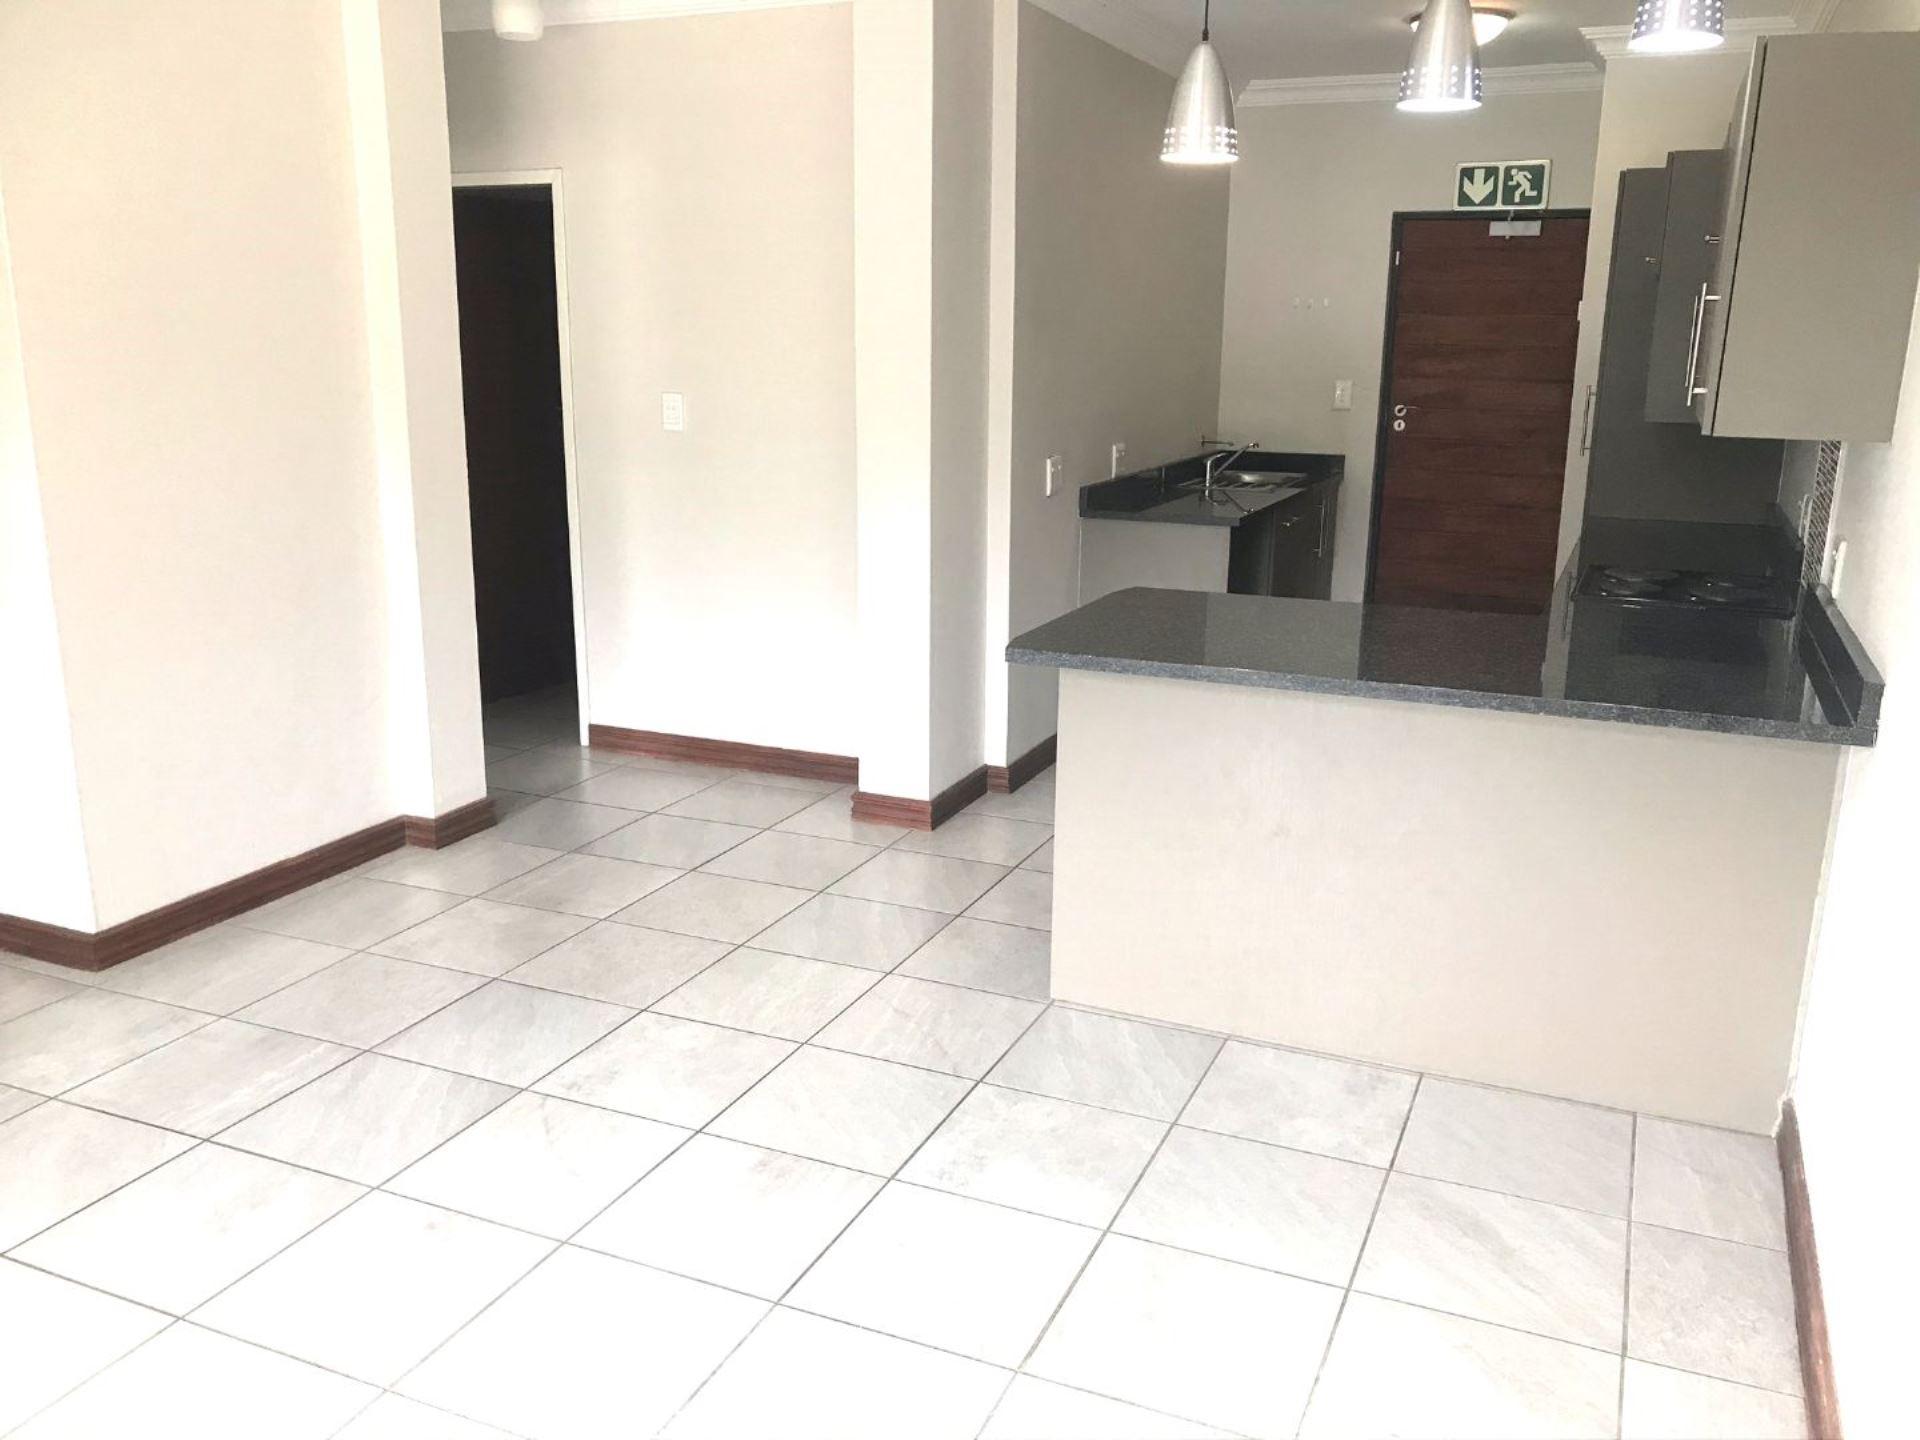 Apartment Rental Monthly in ARCADIA